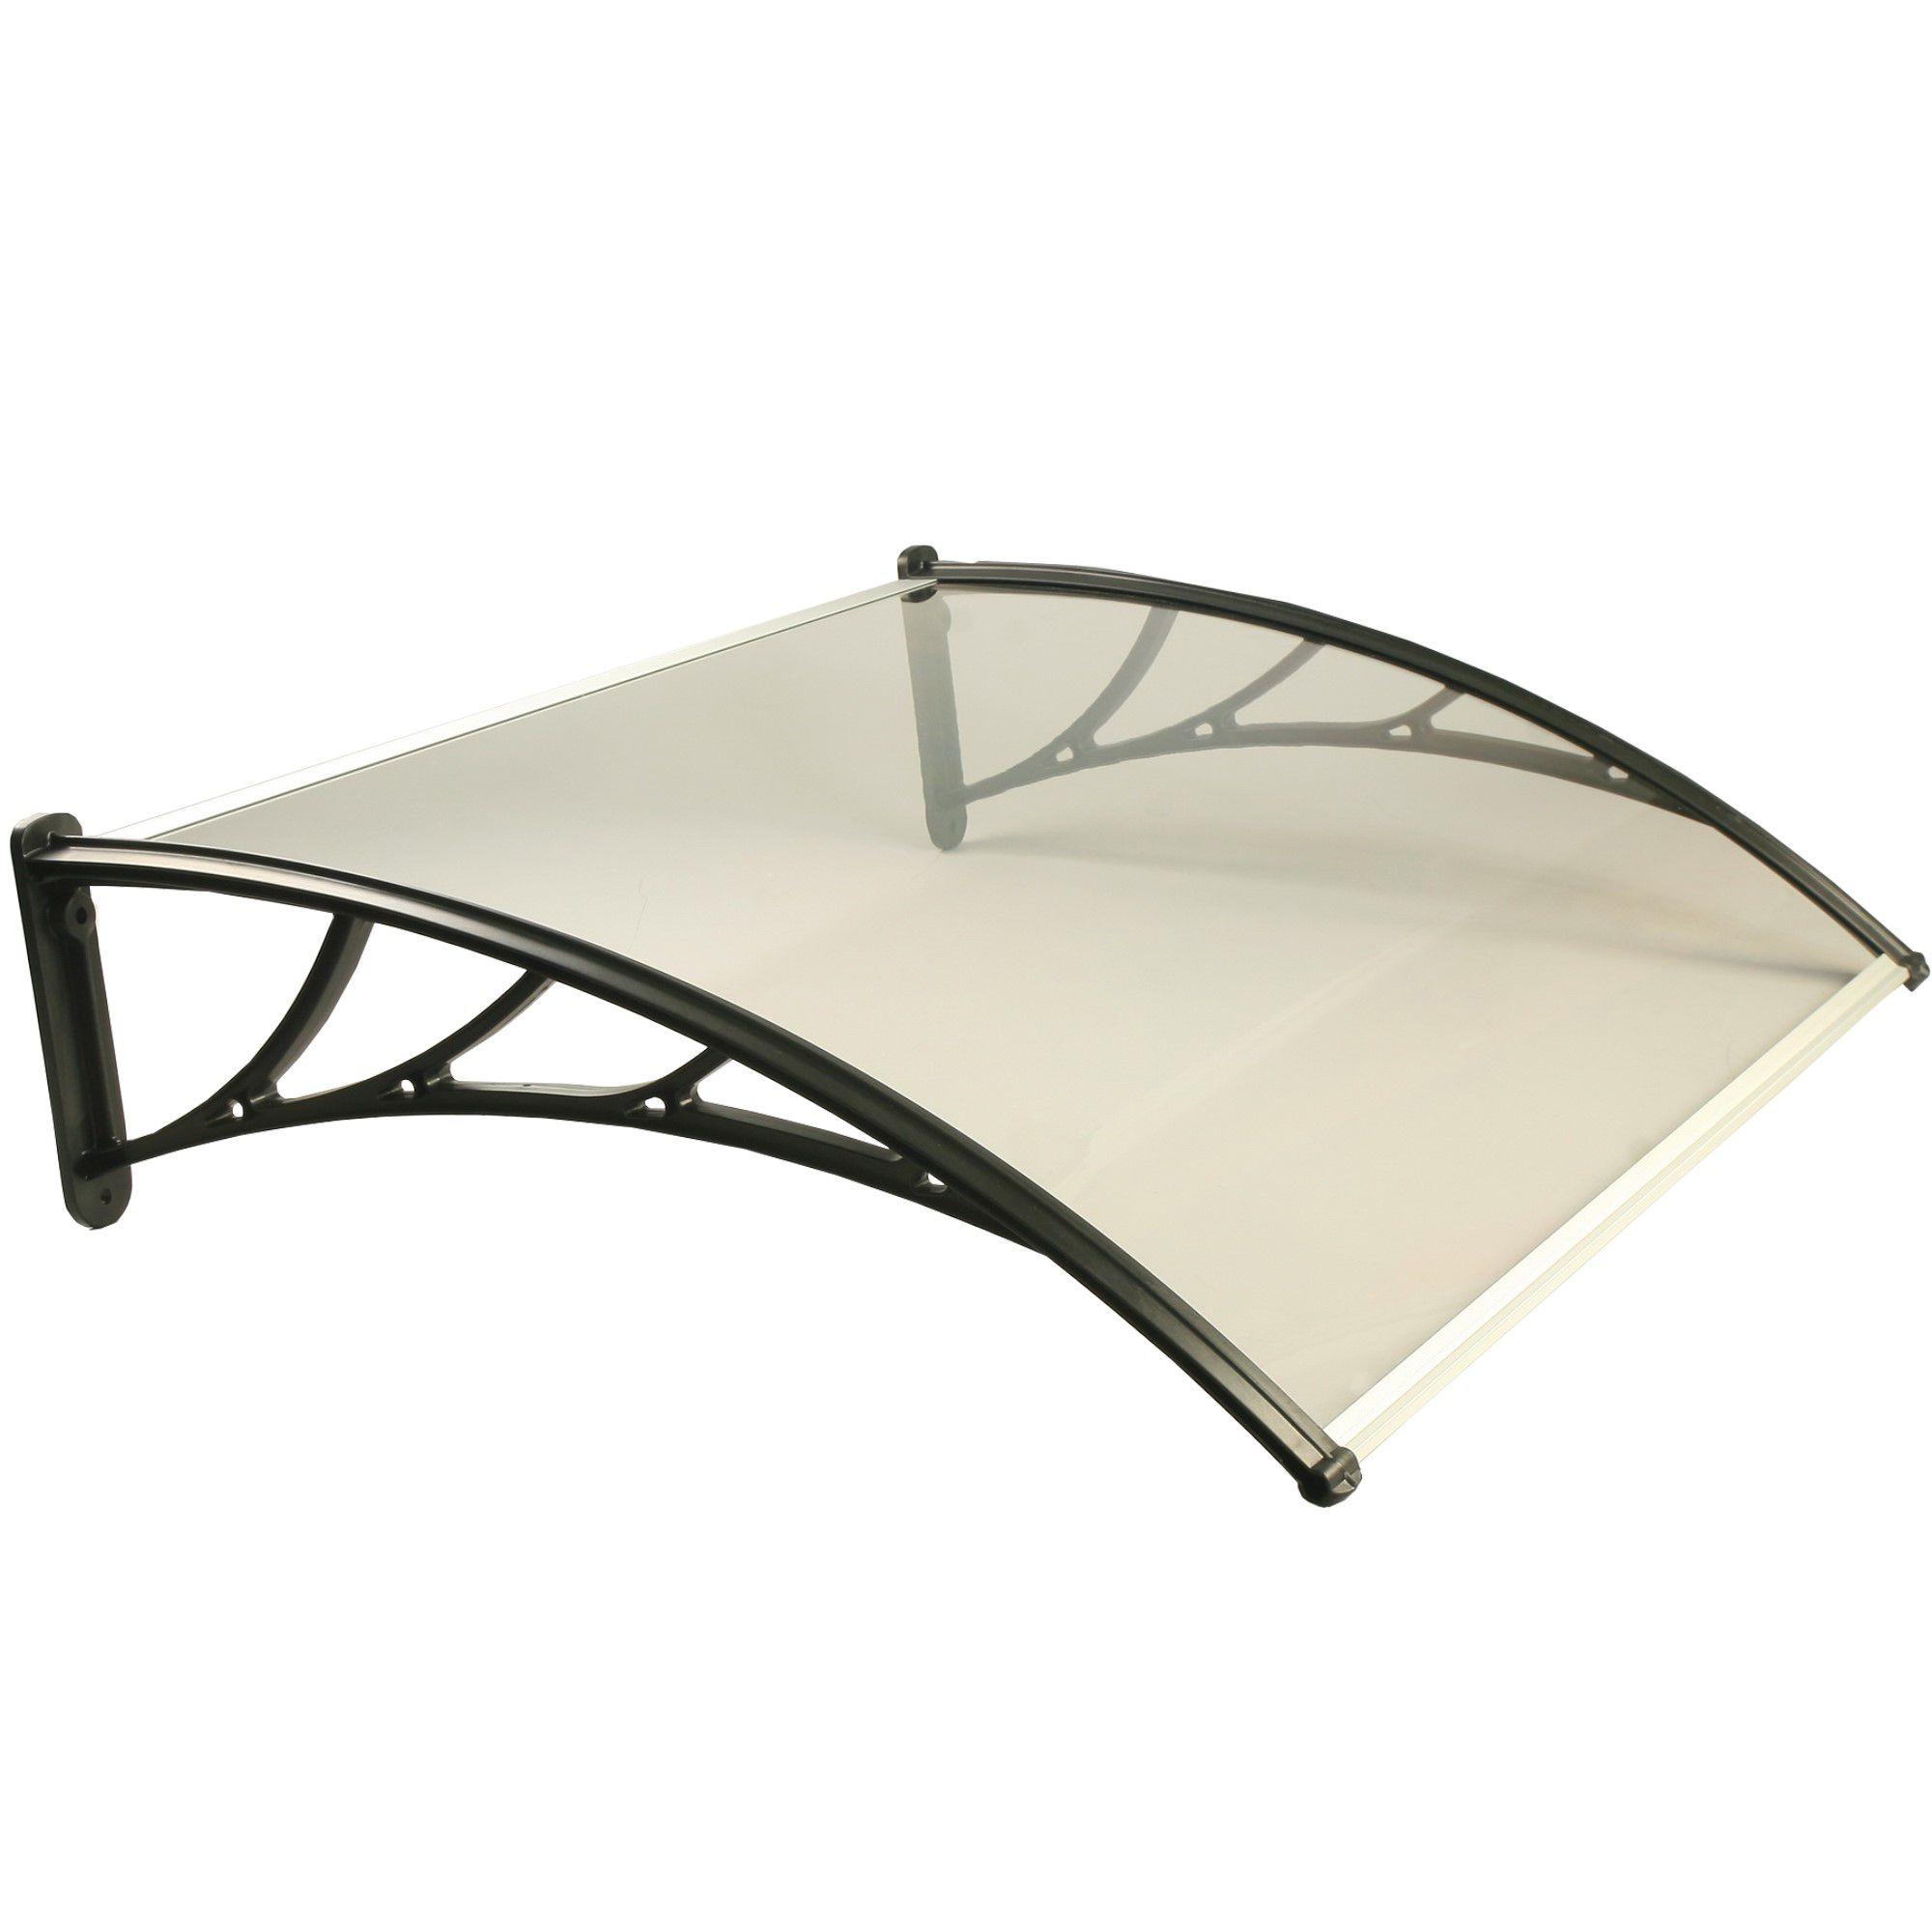 Tornillo Clear Door Canopy (h)73mm (w)1000mm (l)1200mm  sc 1 st  DIY at Bu0026Q & DIY at Bu0026Q